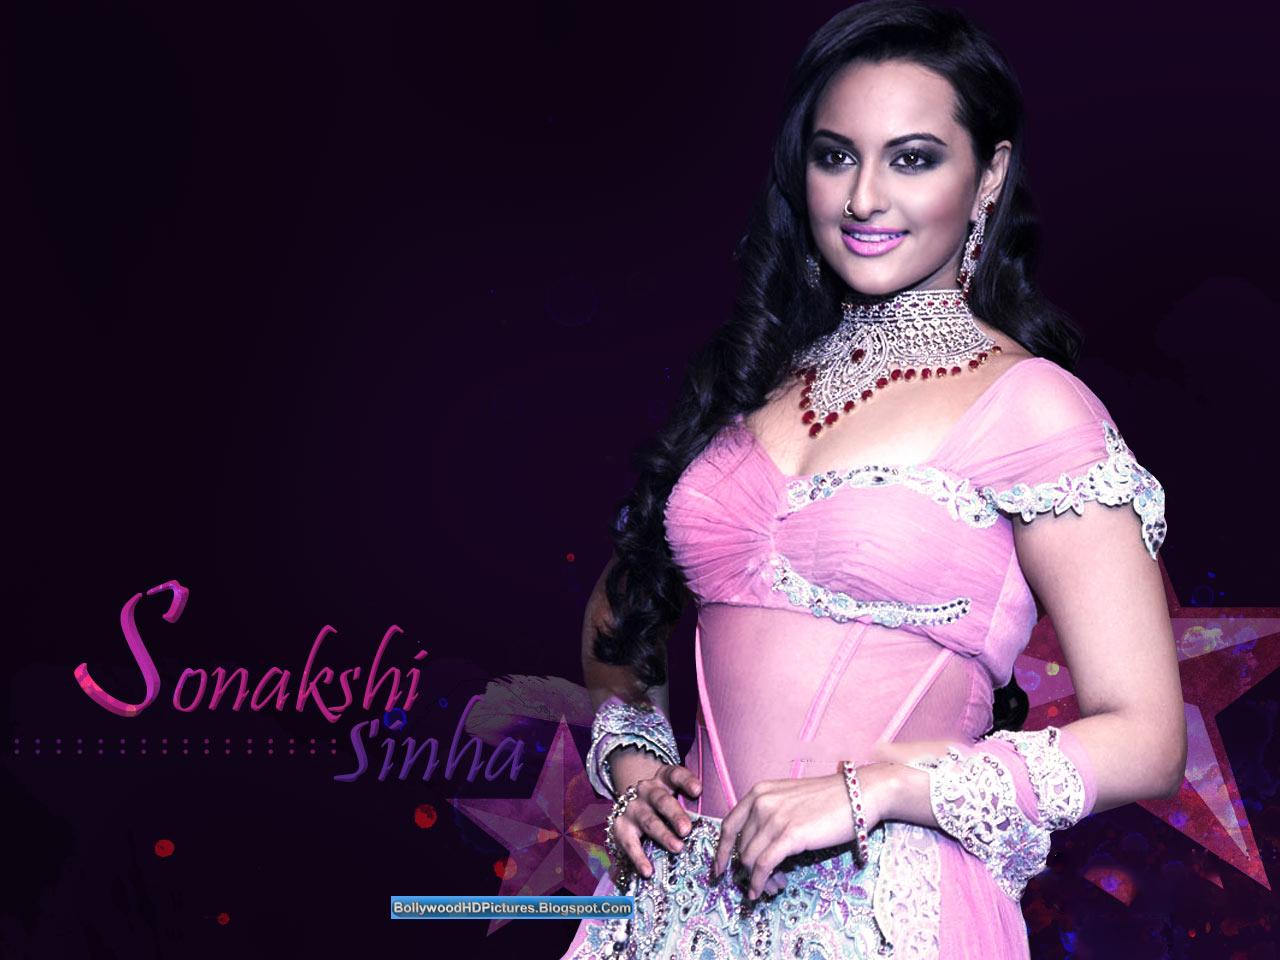 https://3.bp.blogspot.com/--5h1gkUR6dY/T-DArYllAtI/AAAAAAAAH30/f0V_rVQzLq8/s1600/Sonakashi+Sinha+Latest+HD+Wallpapers+by+Bollywoodhdpictures.blogspot.com+(6).jpg